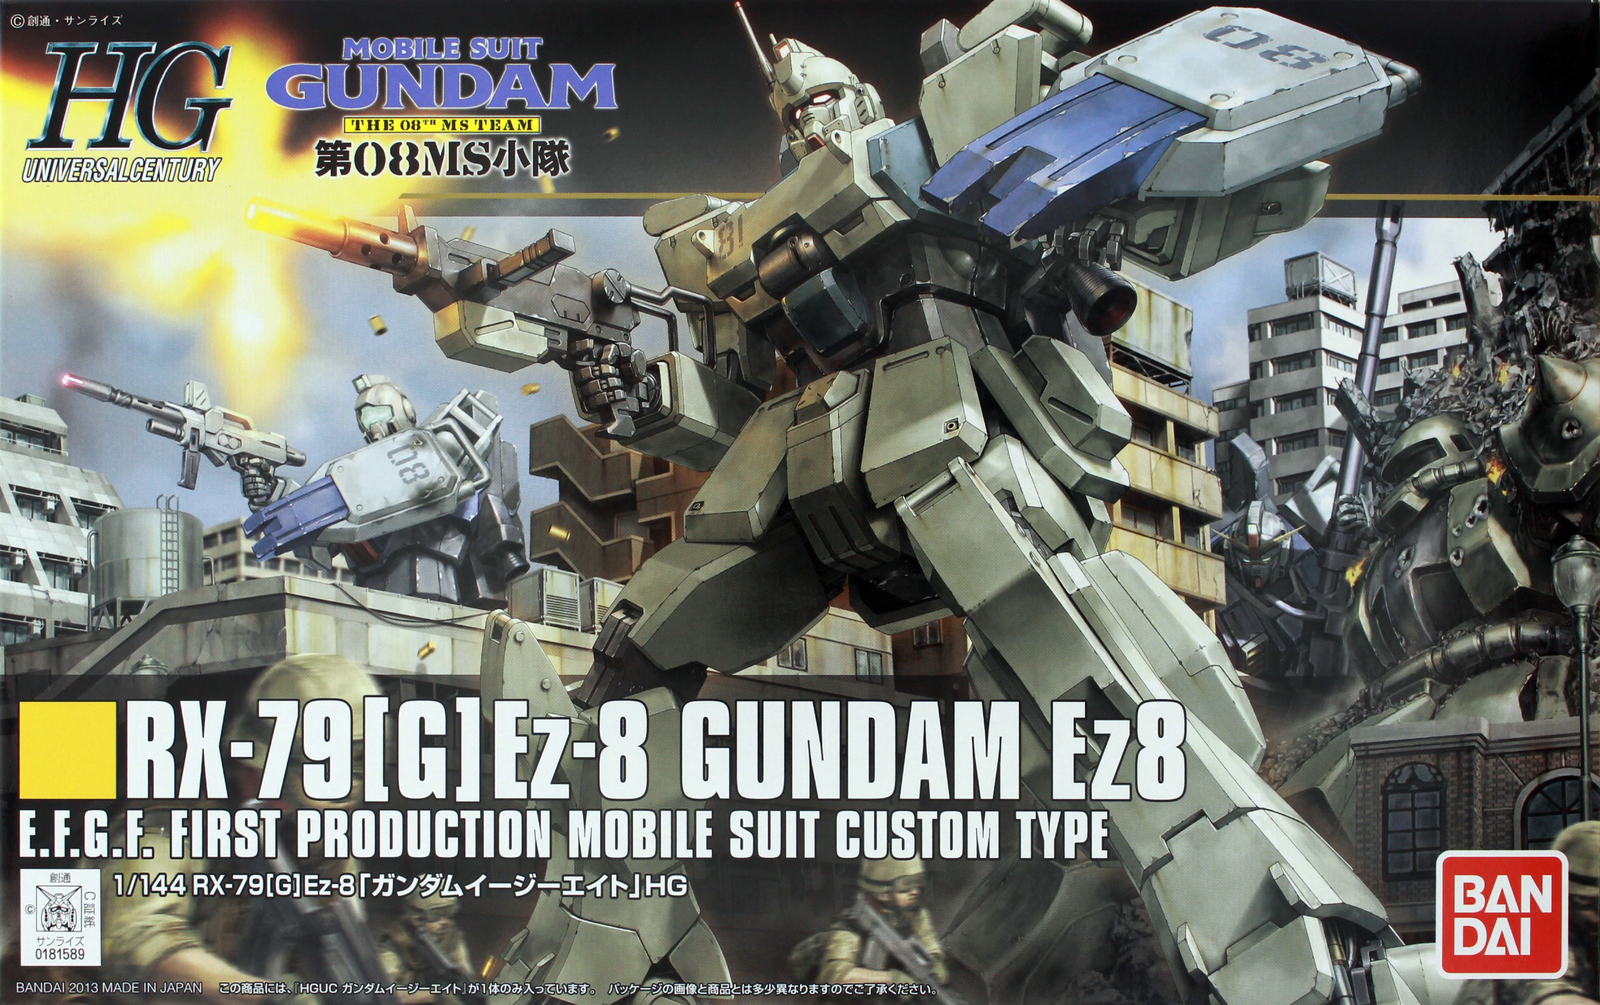 HGUC 1/144 Gundam Ez8 - Model Kit image